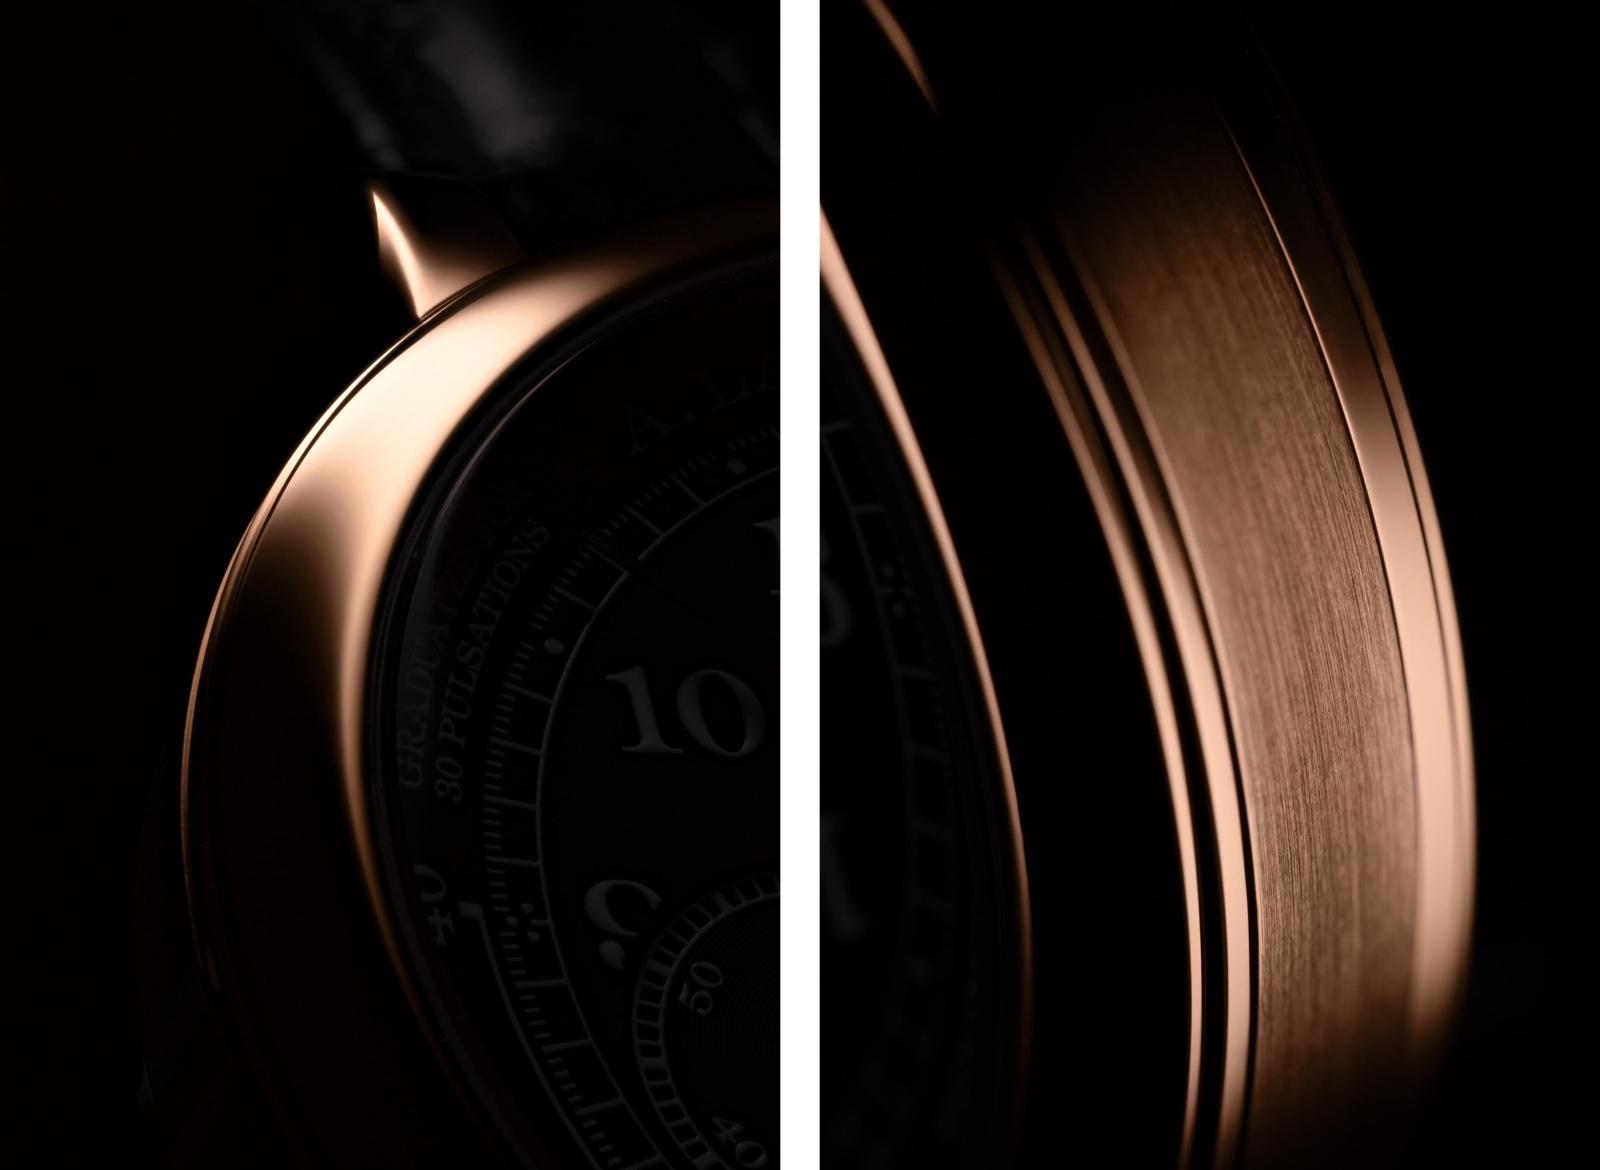 Lange 1815 Chronograph Detalles 1